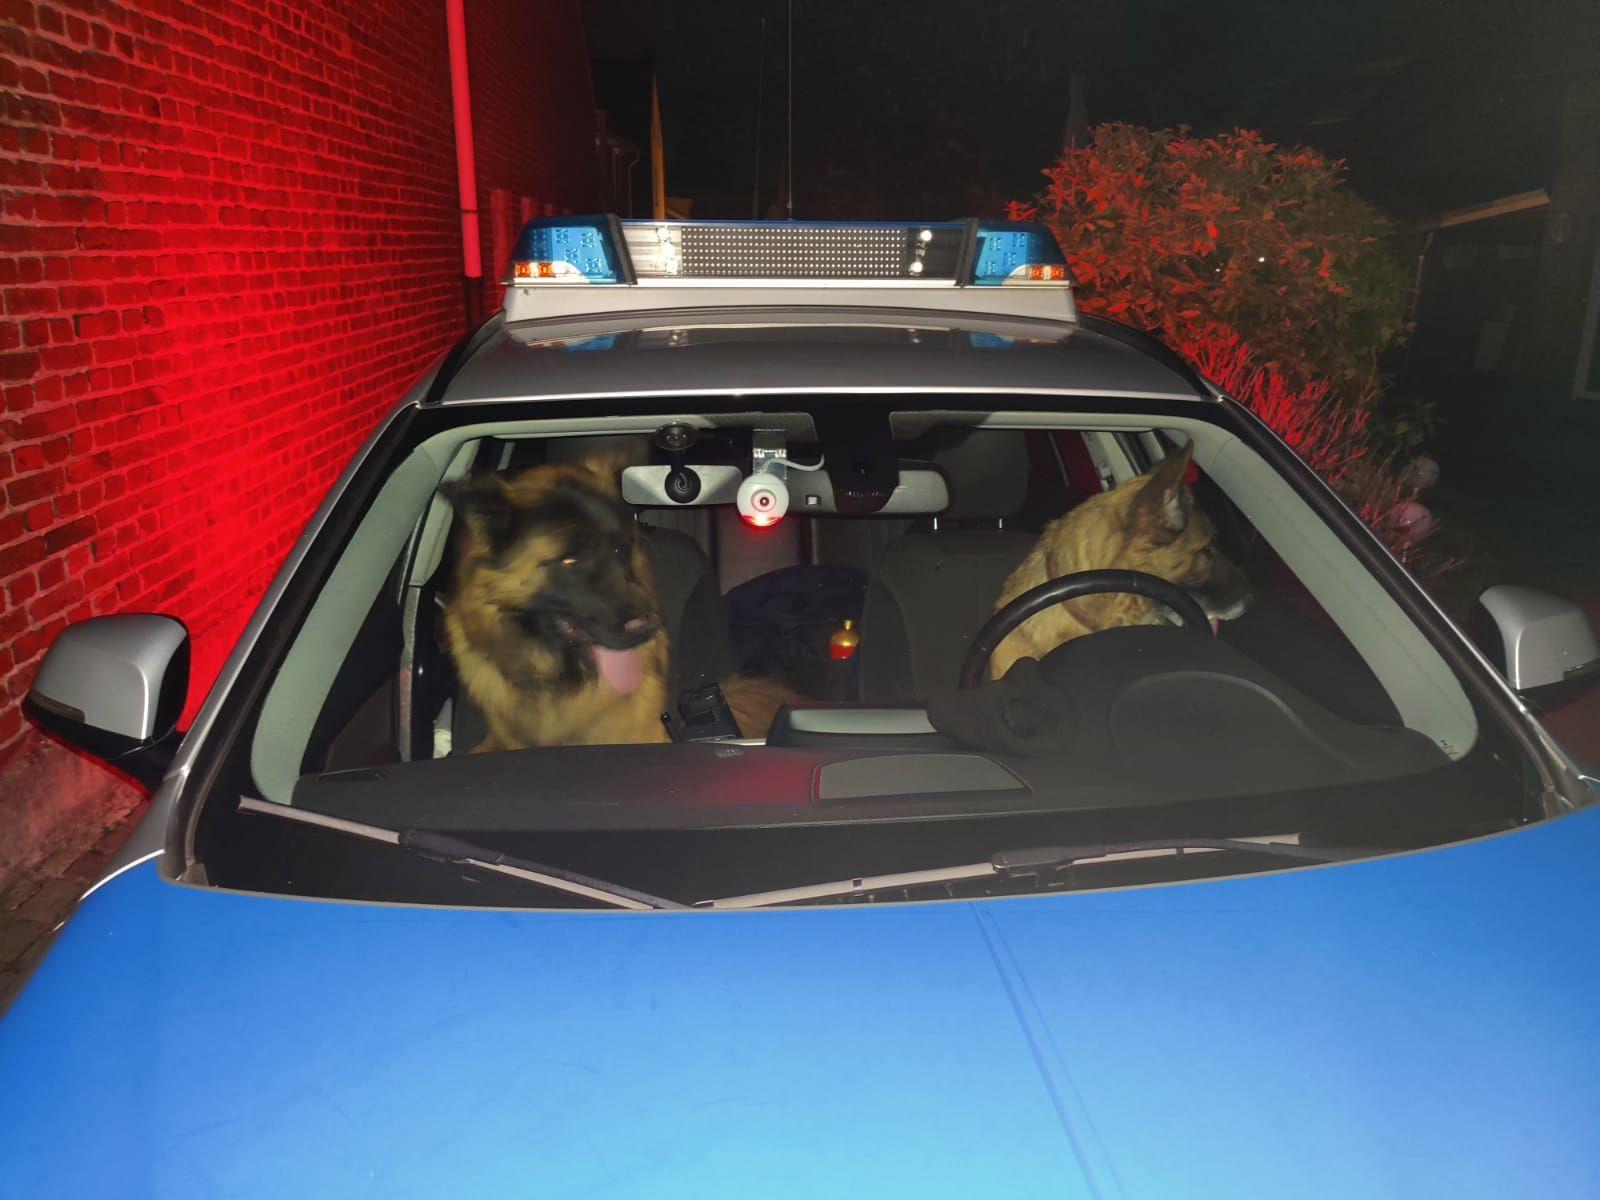 Hunde kapern Streifenwagen